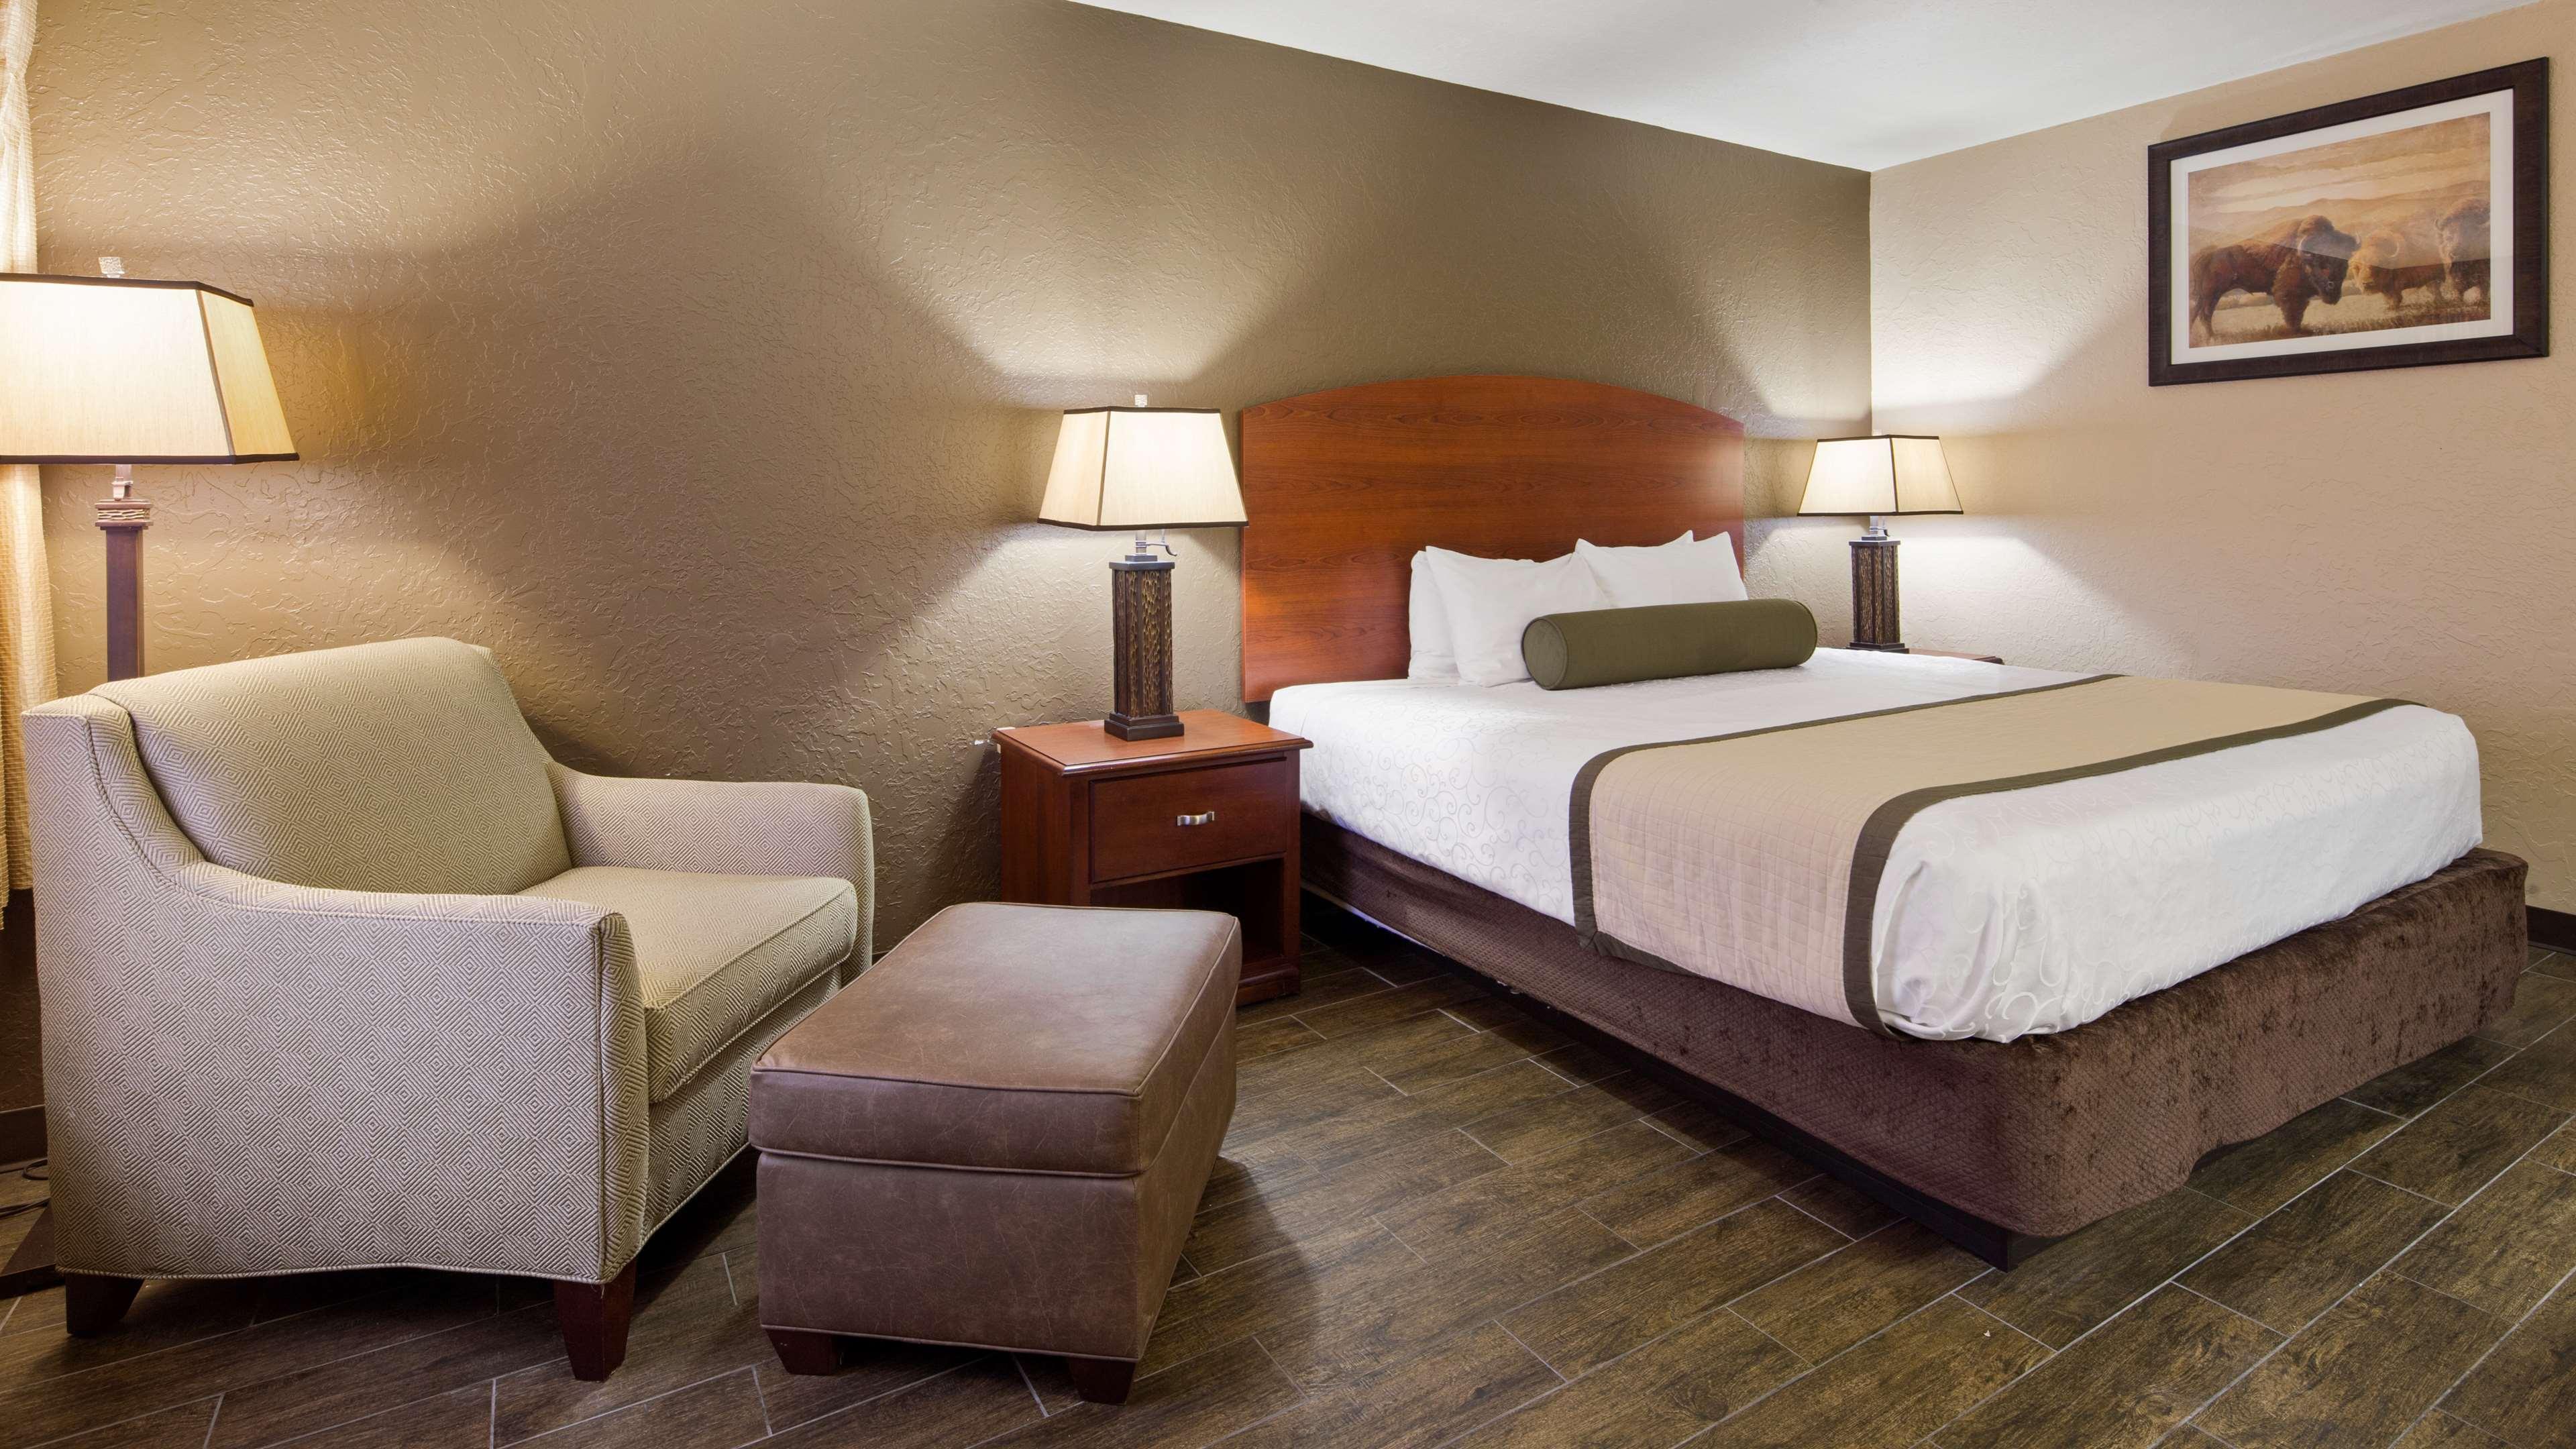 Best Western Plus Lawton Hotel & Convention Center image 10